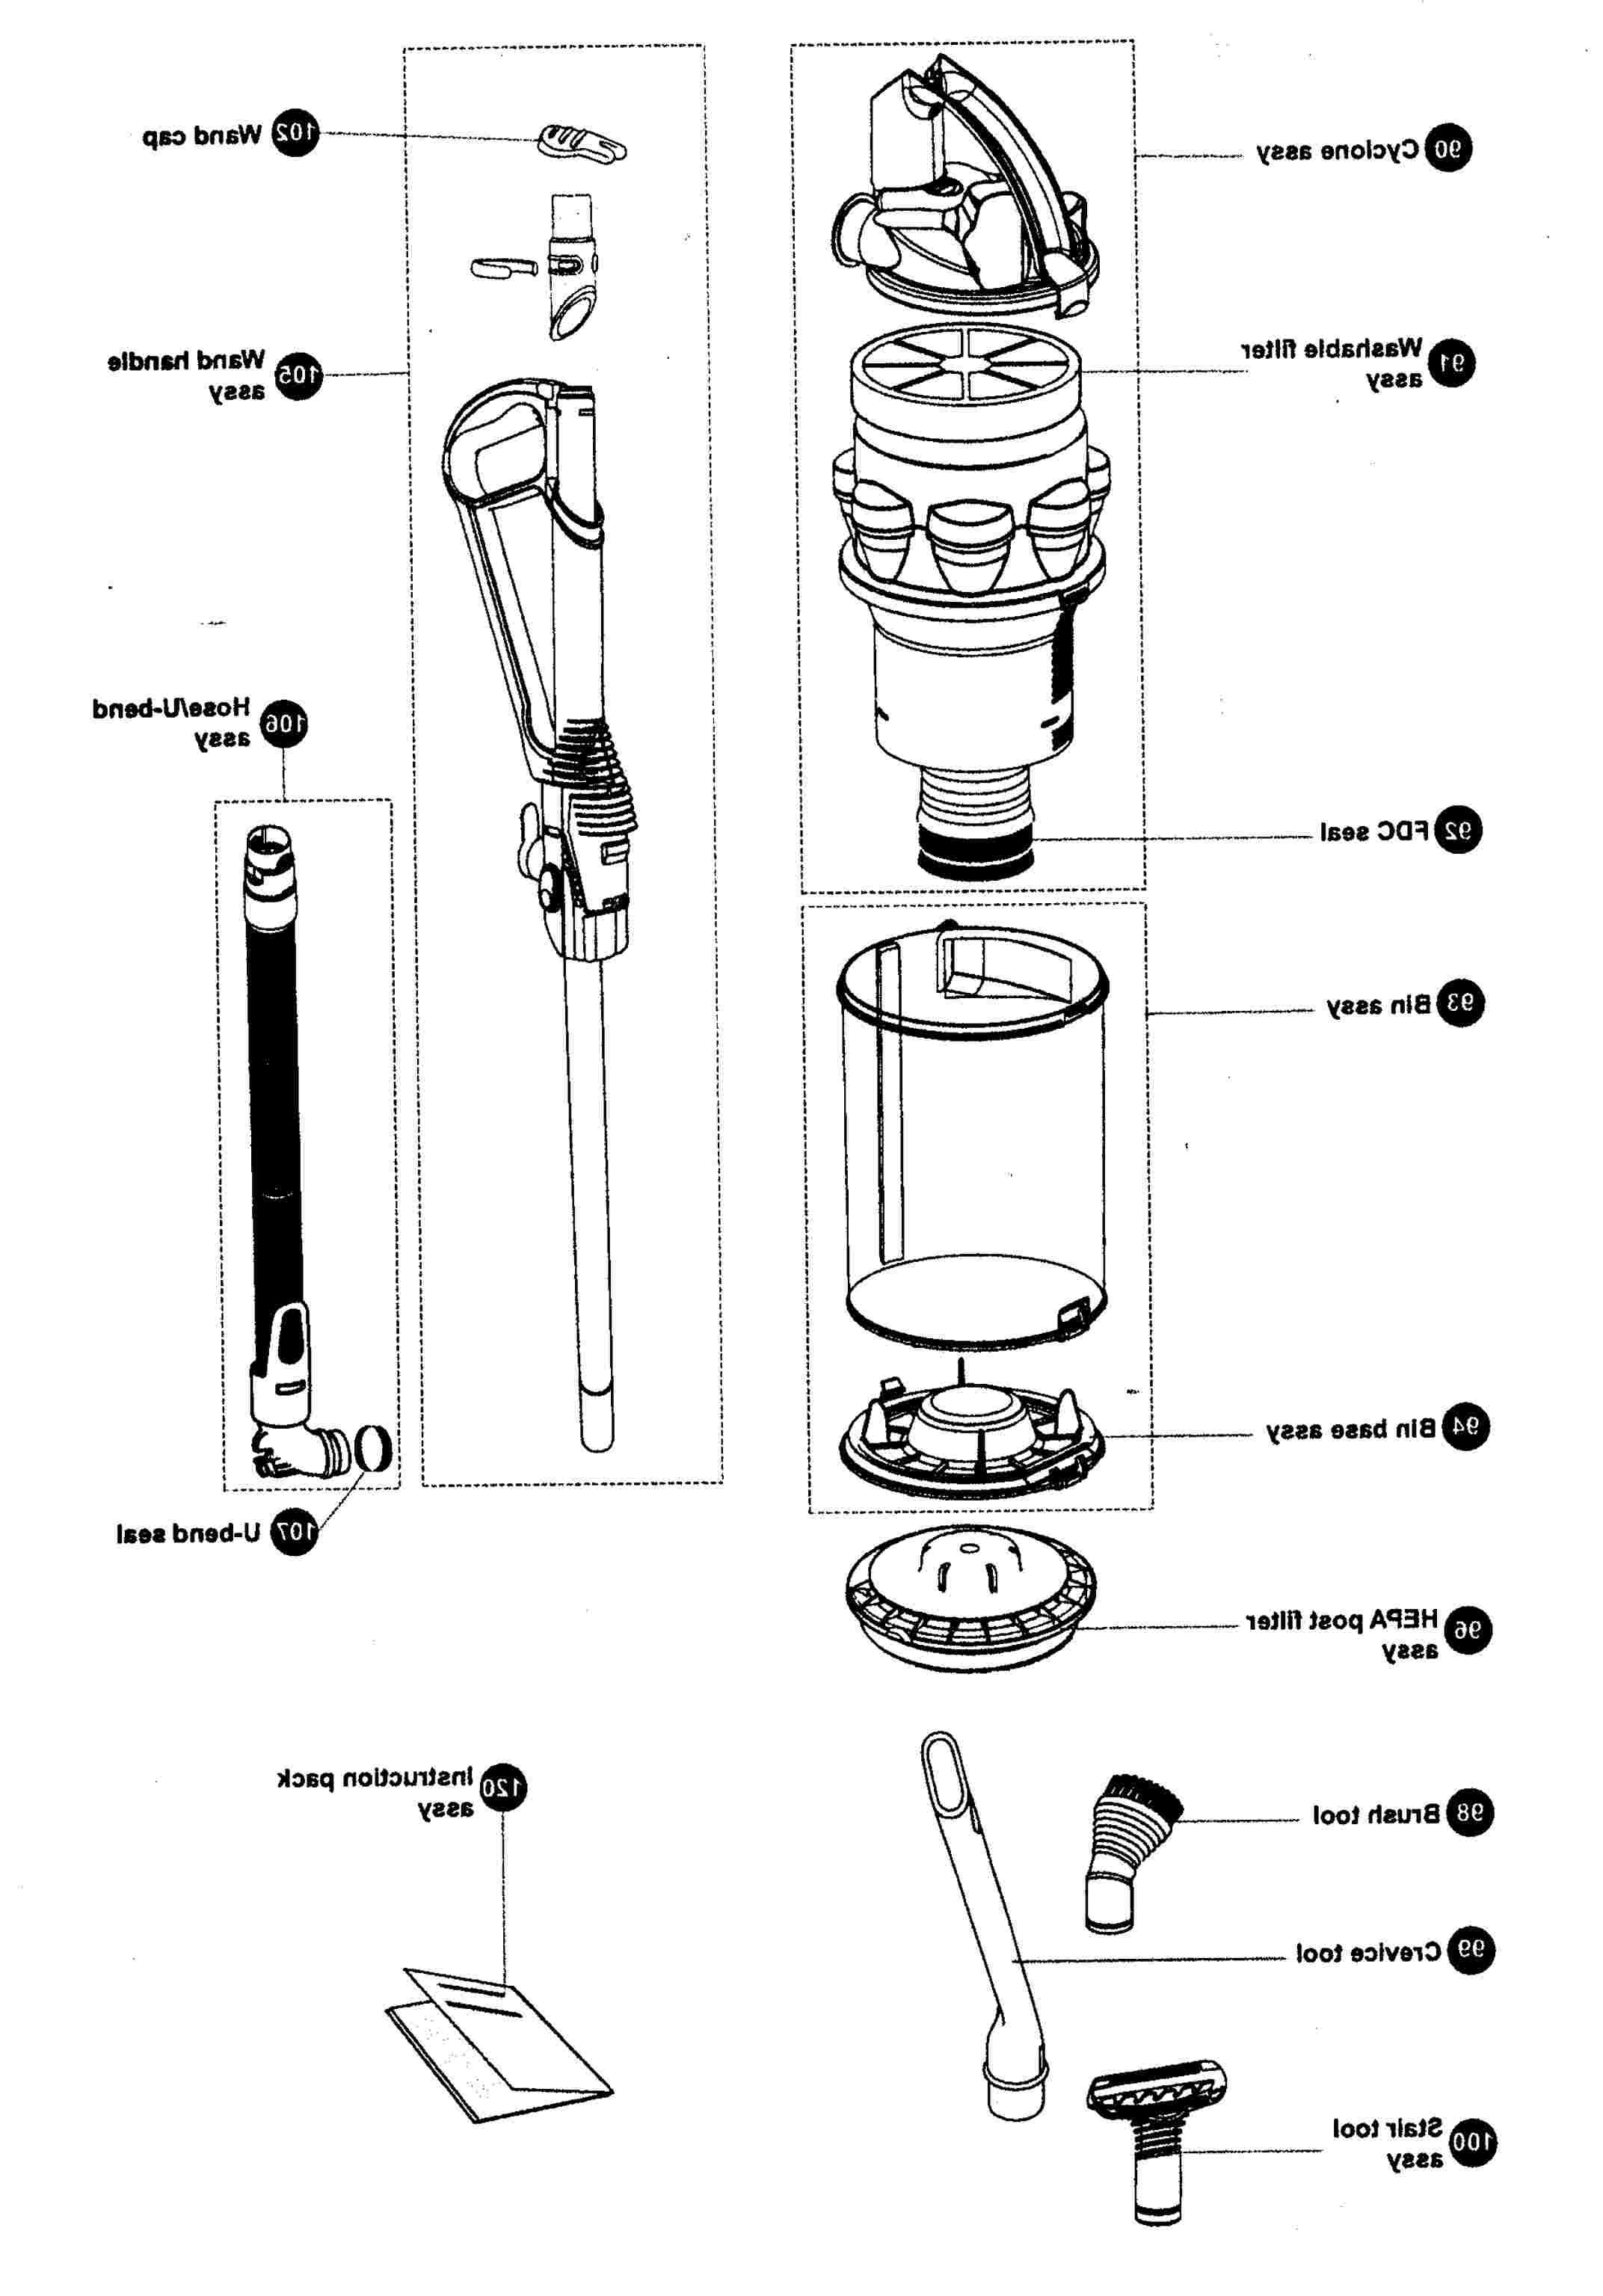 dyson vacuum cleaner parts for sale